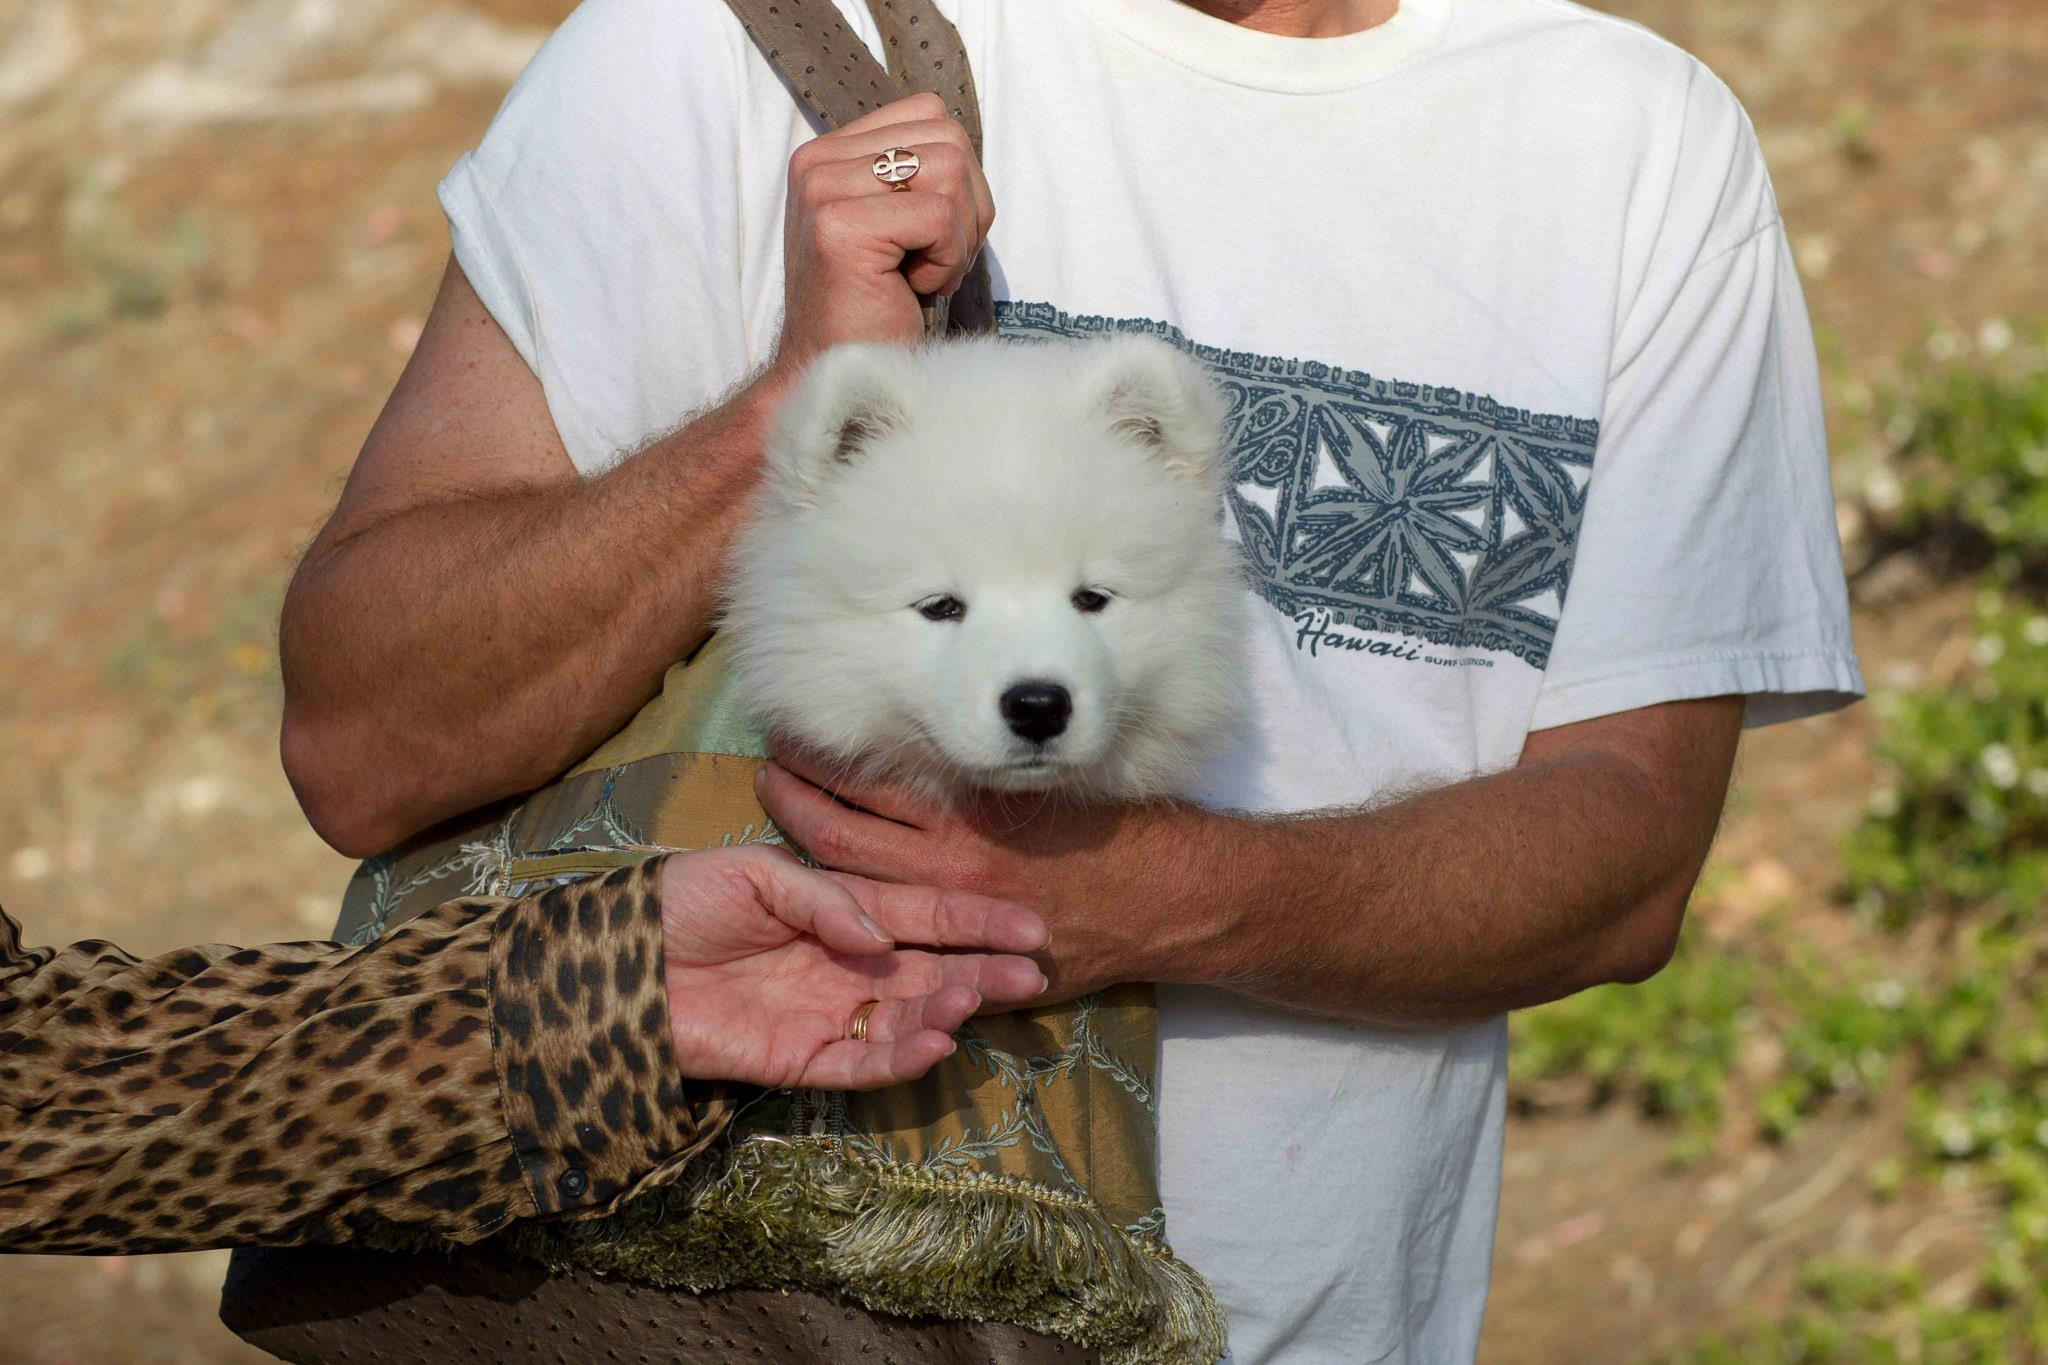 a purse puppy